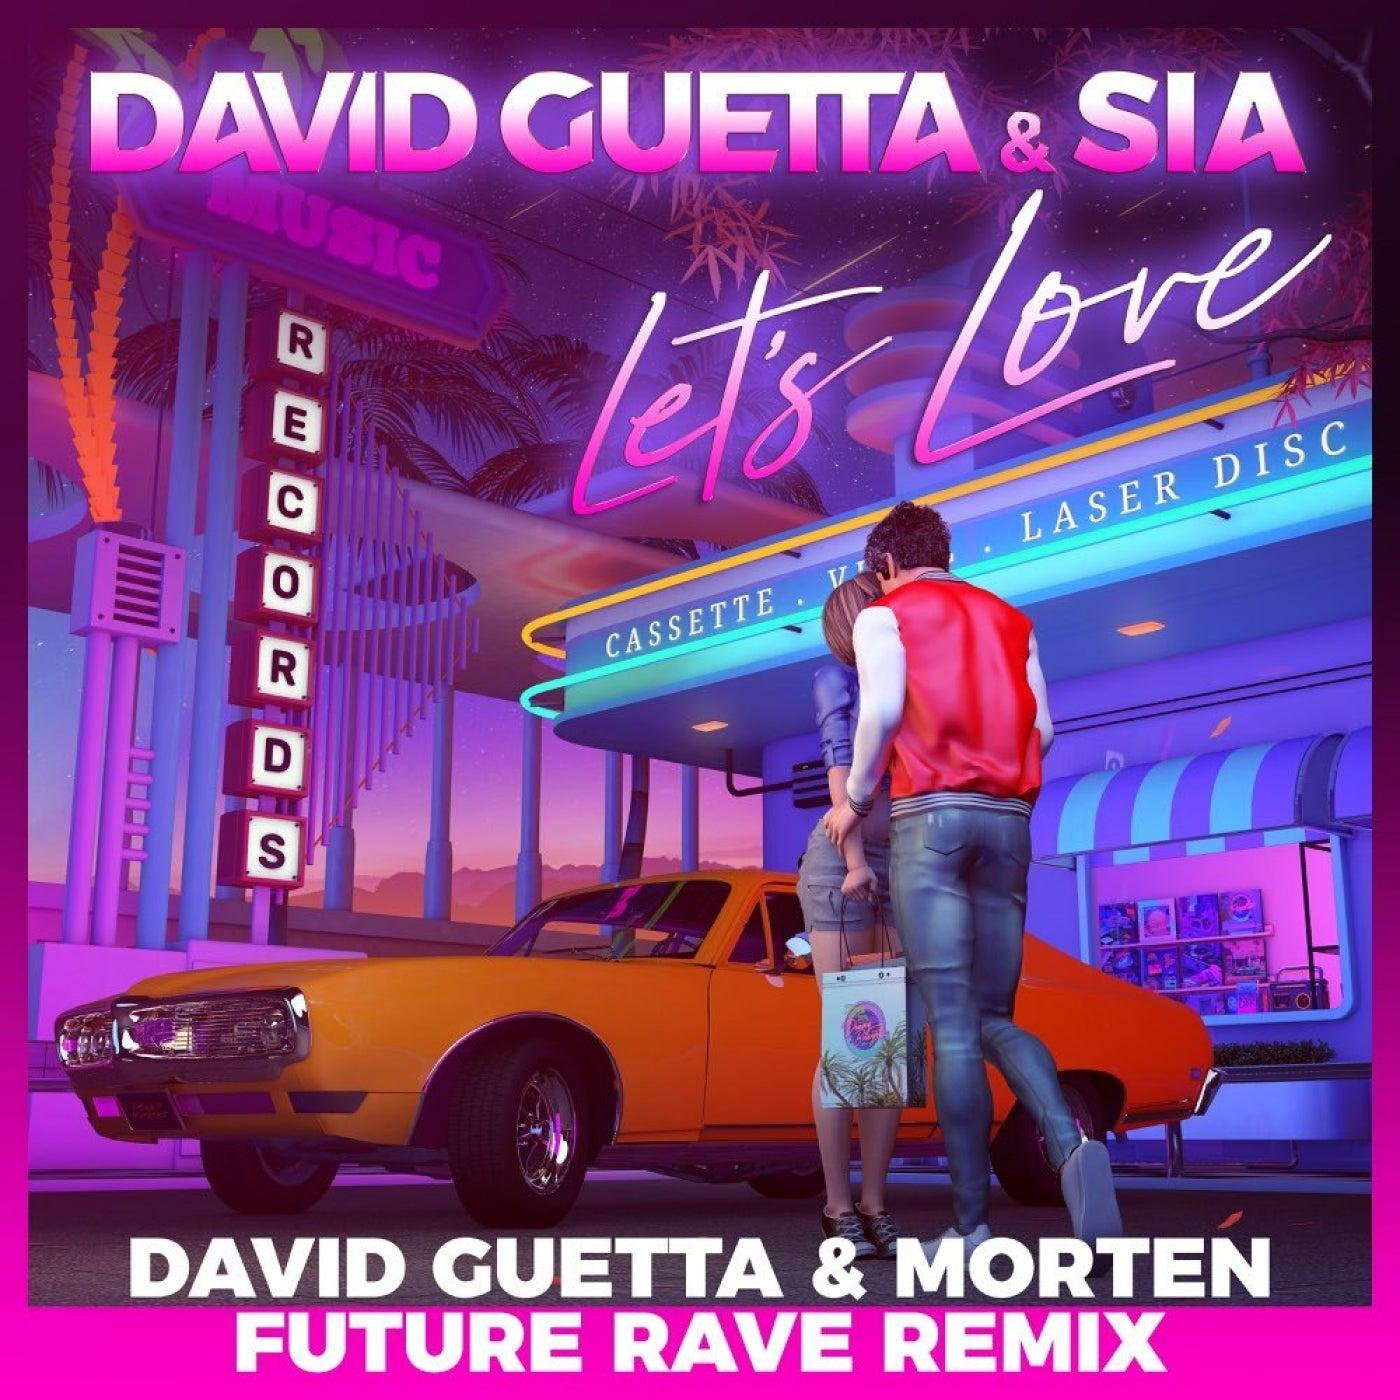 Let's Love (David Guetta & MORTEN Future Rave Remix; Extended)